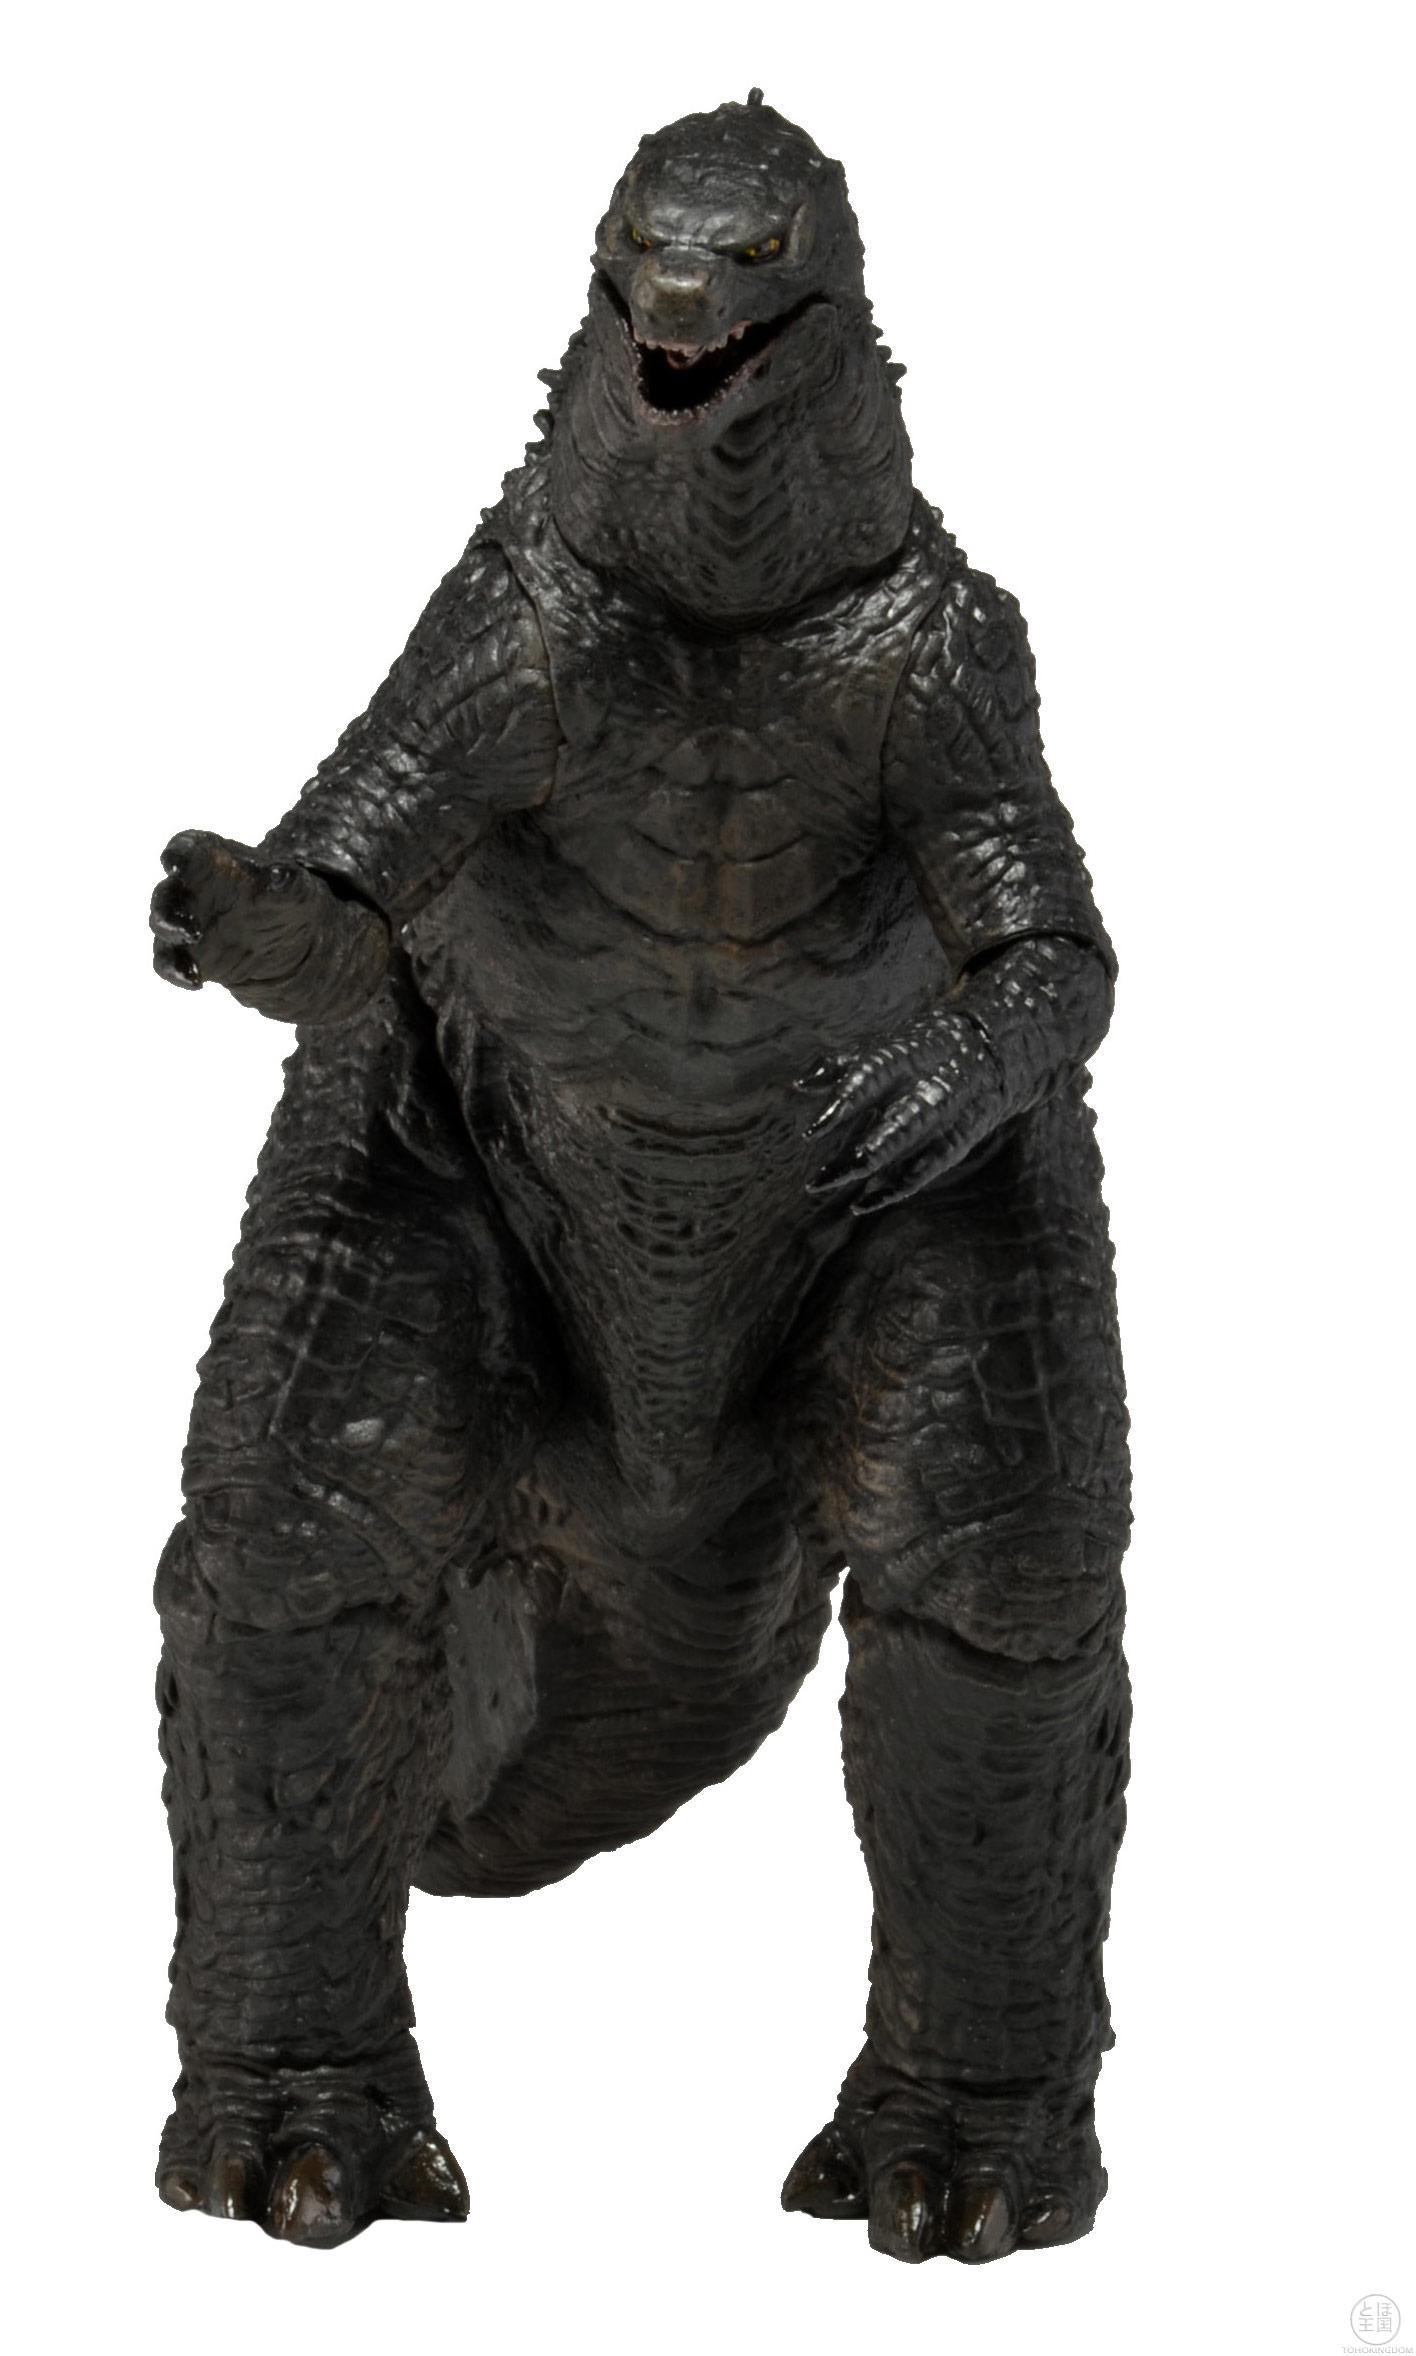 NECA Godzilla 12-Inch and 24-Inch Prototypes Revealed ...